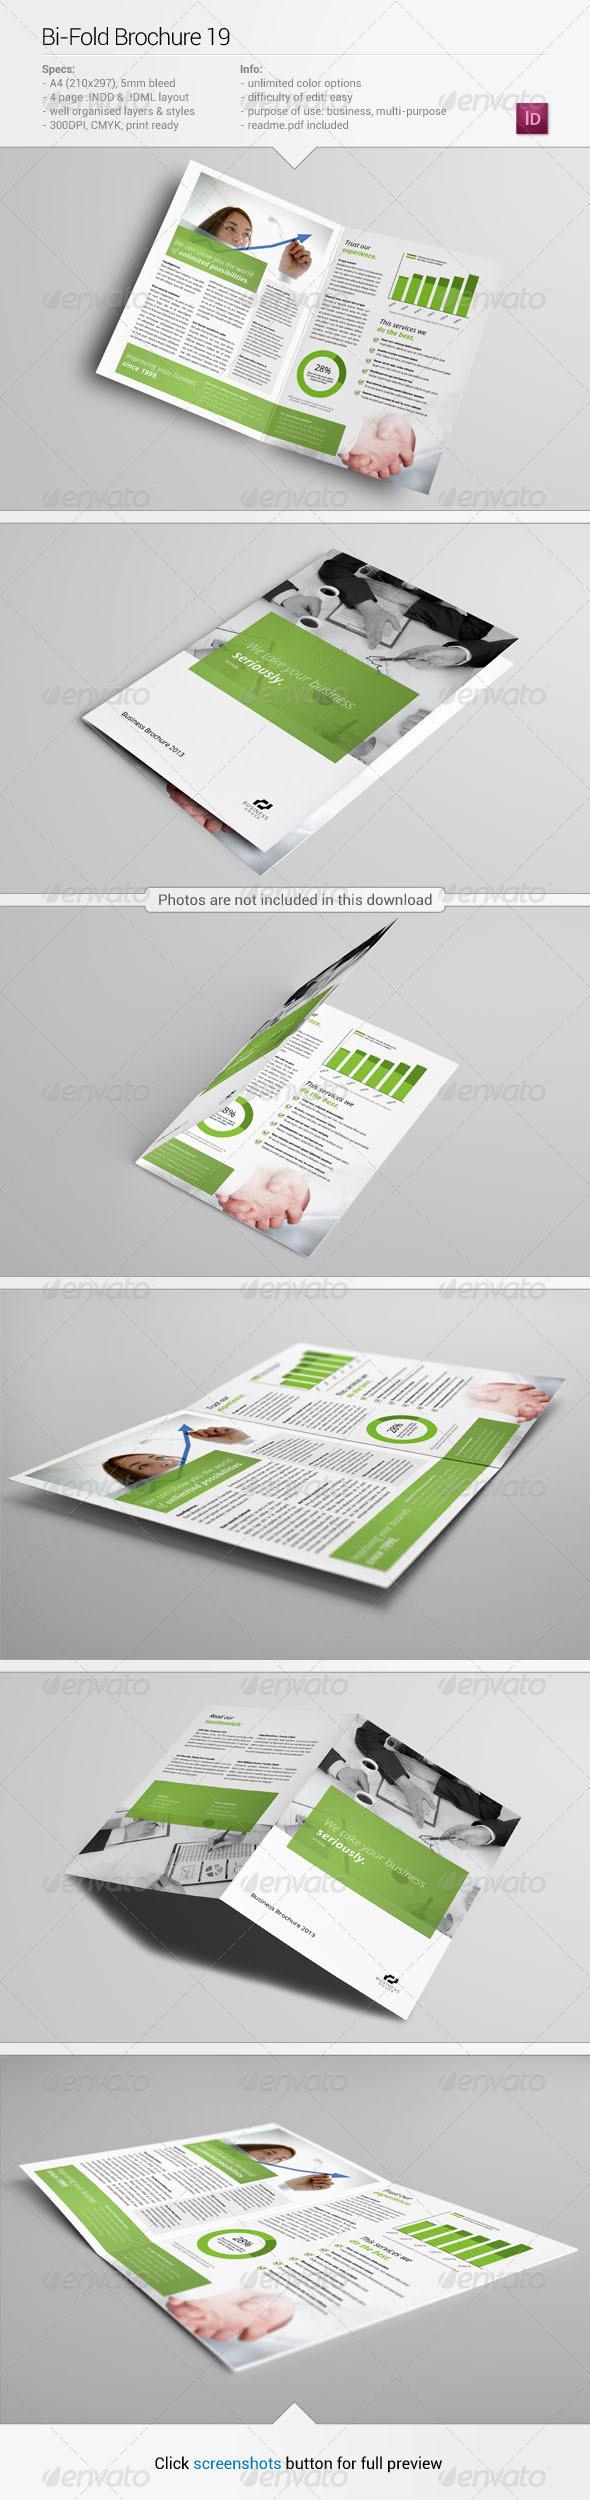 GraphicRiver Bi-Fold Brochure 19 5672916